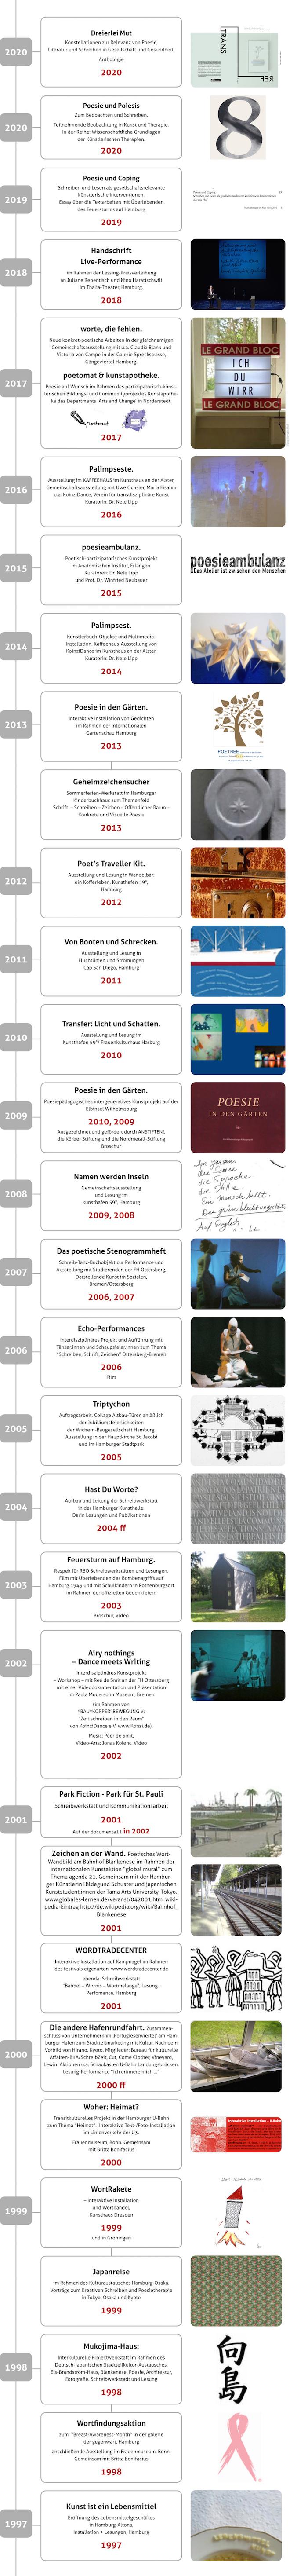 projectline_web_profinkhof_4:2020_1